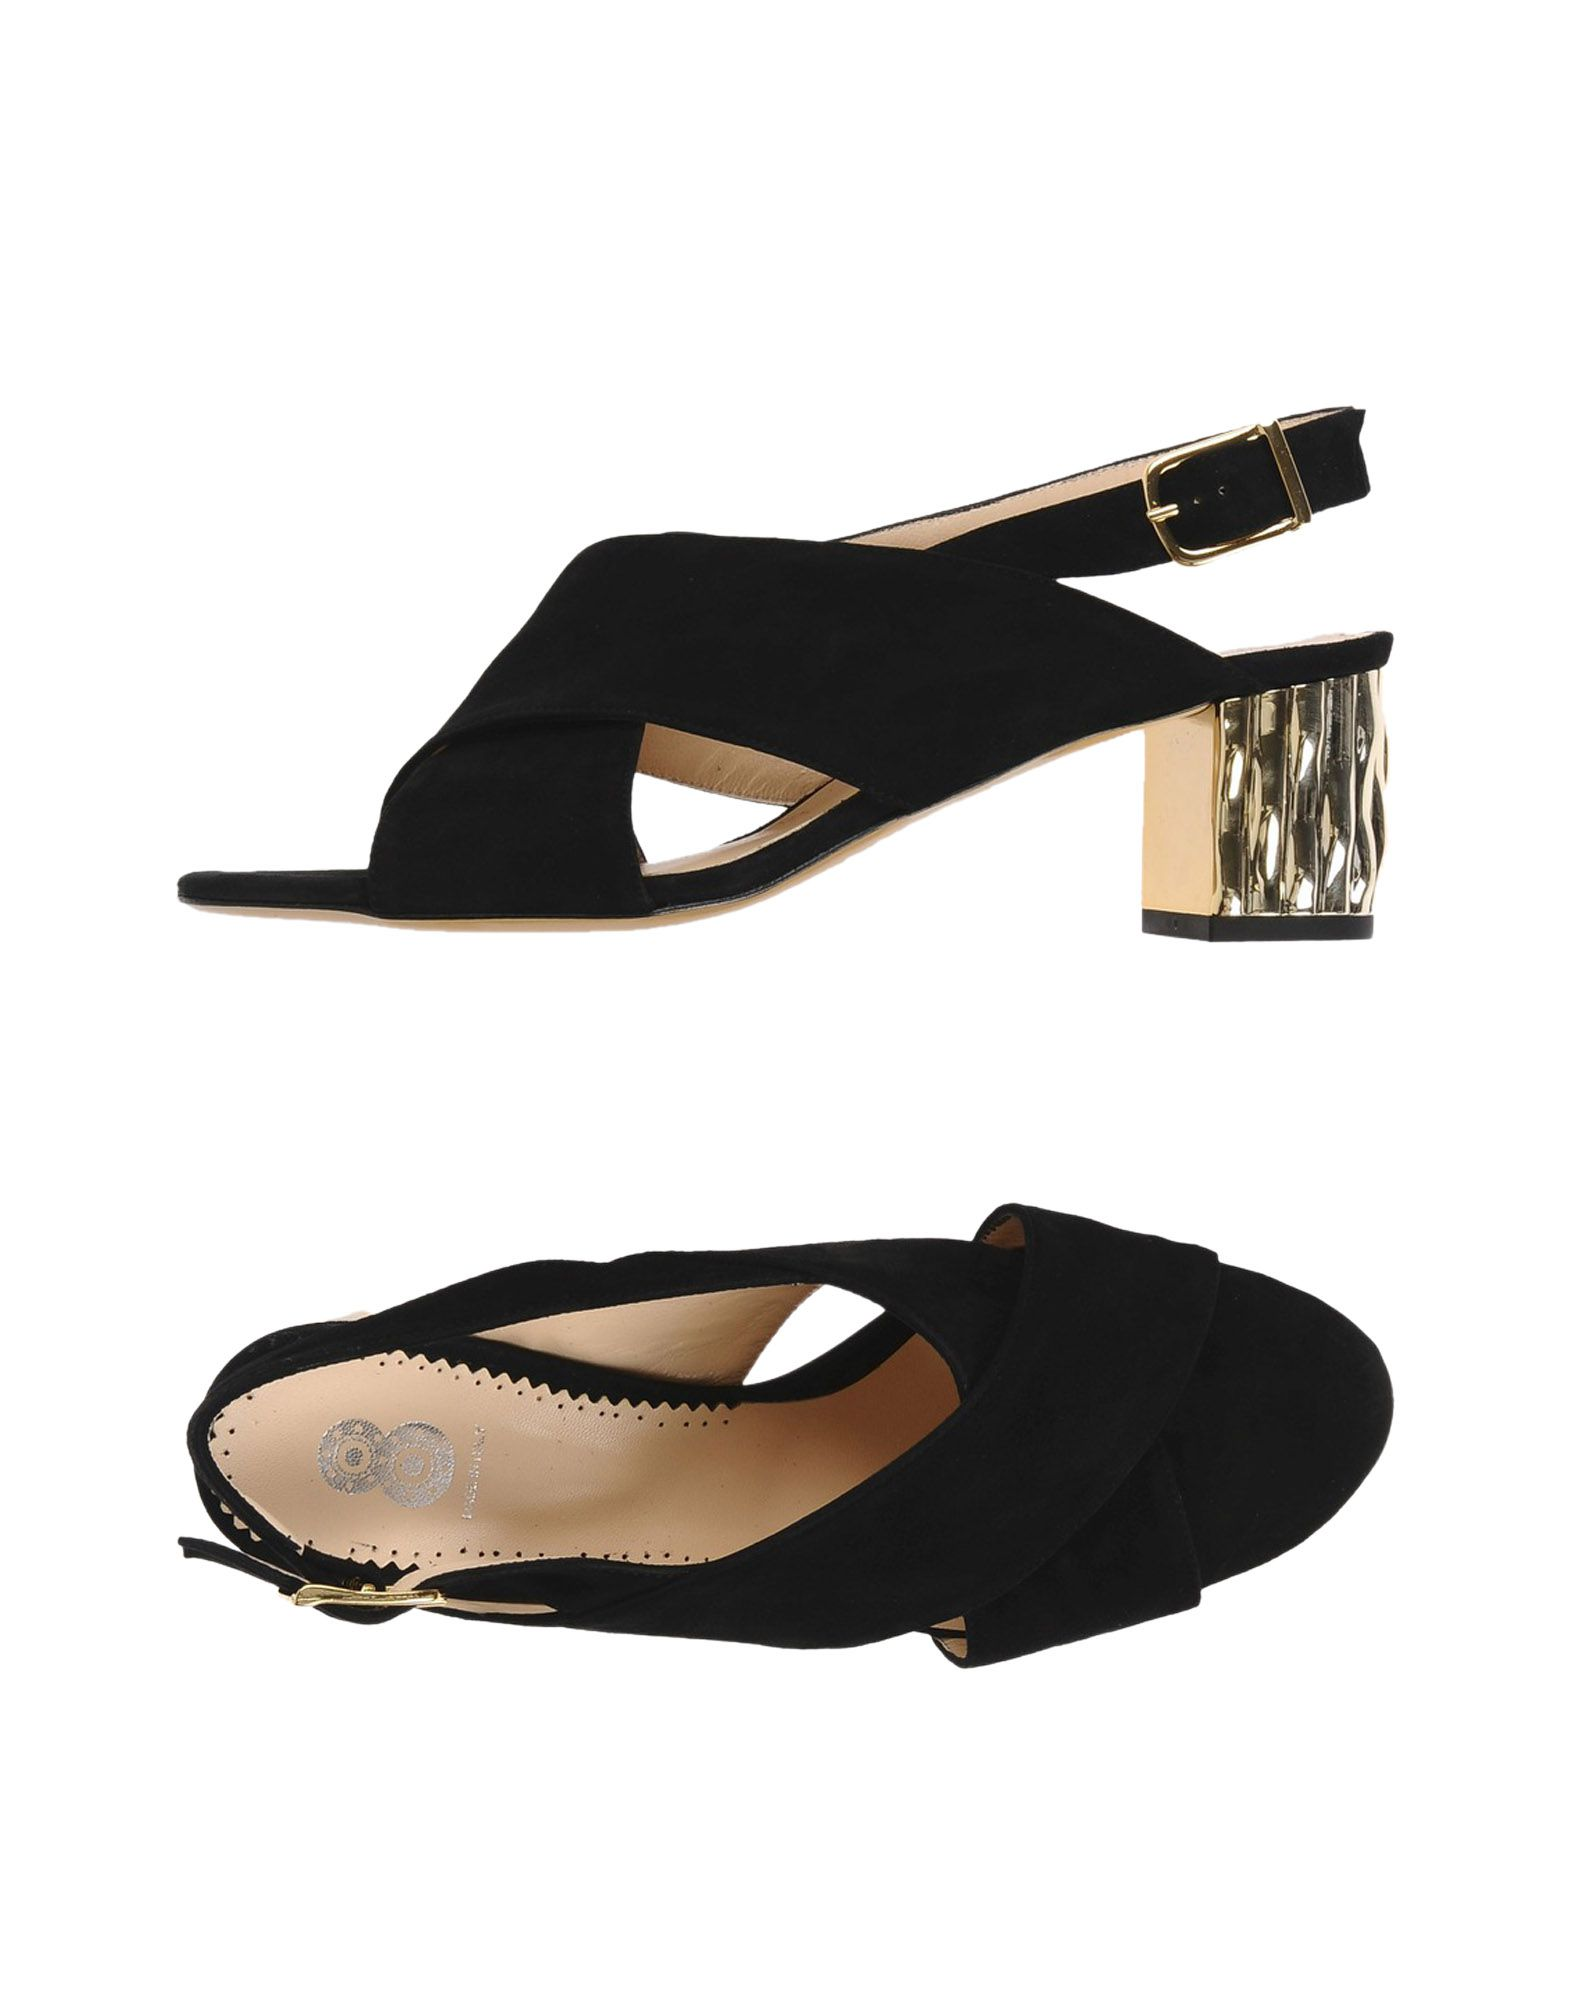 8 Sandalen Damen  11452861FS Gute Qualität beliebte Schuhe